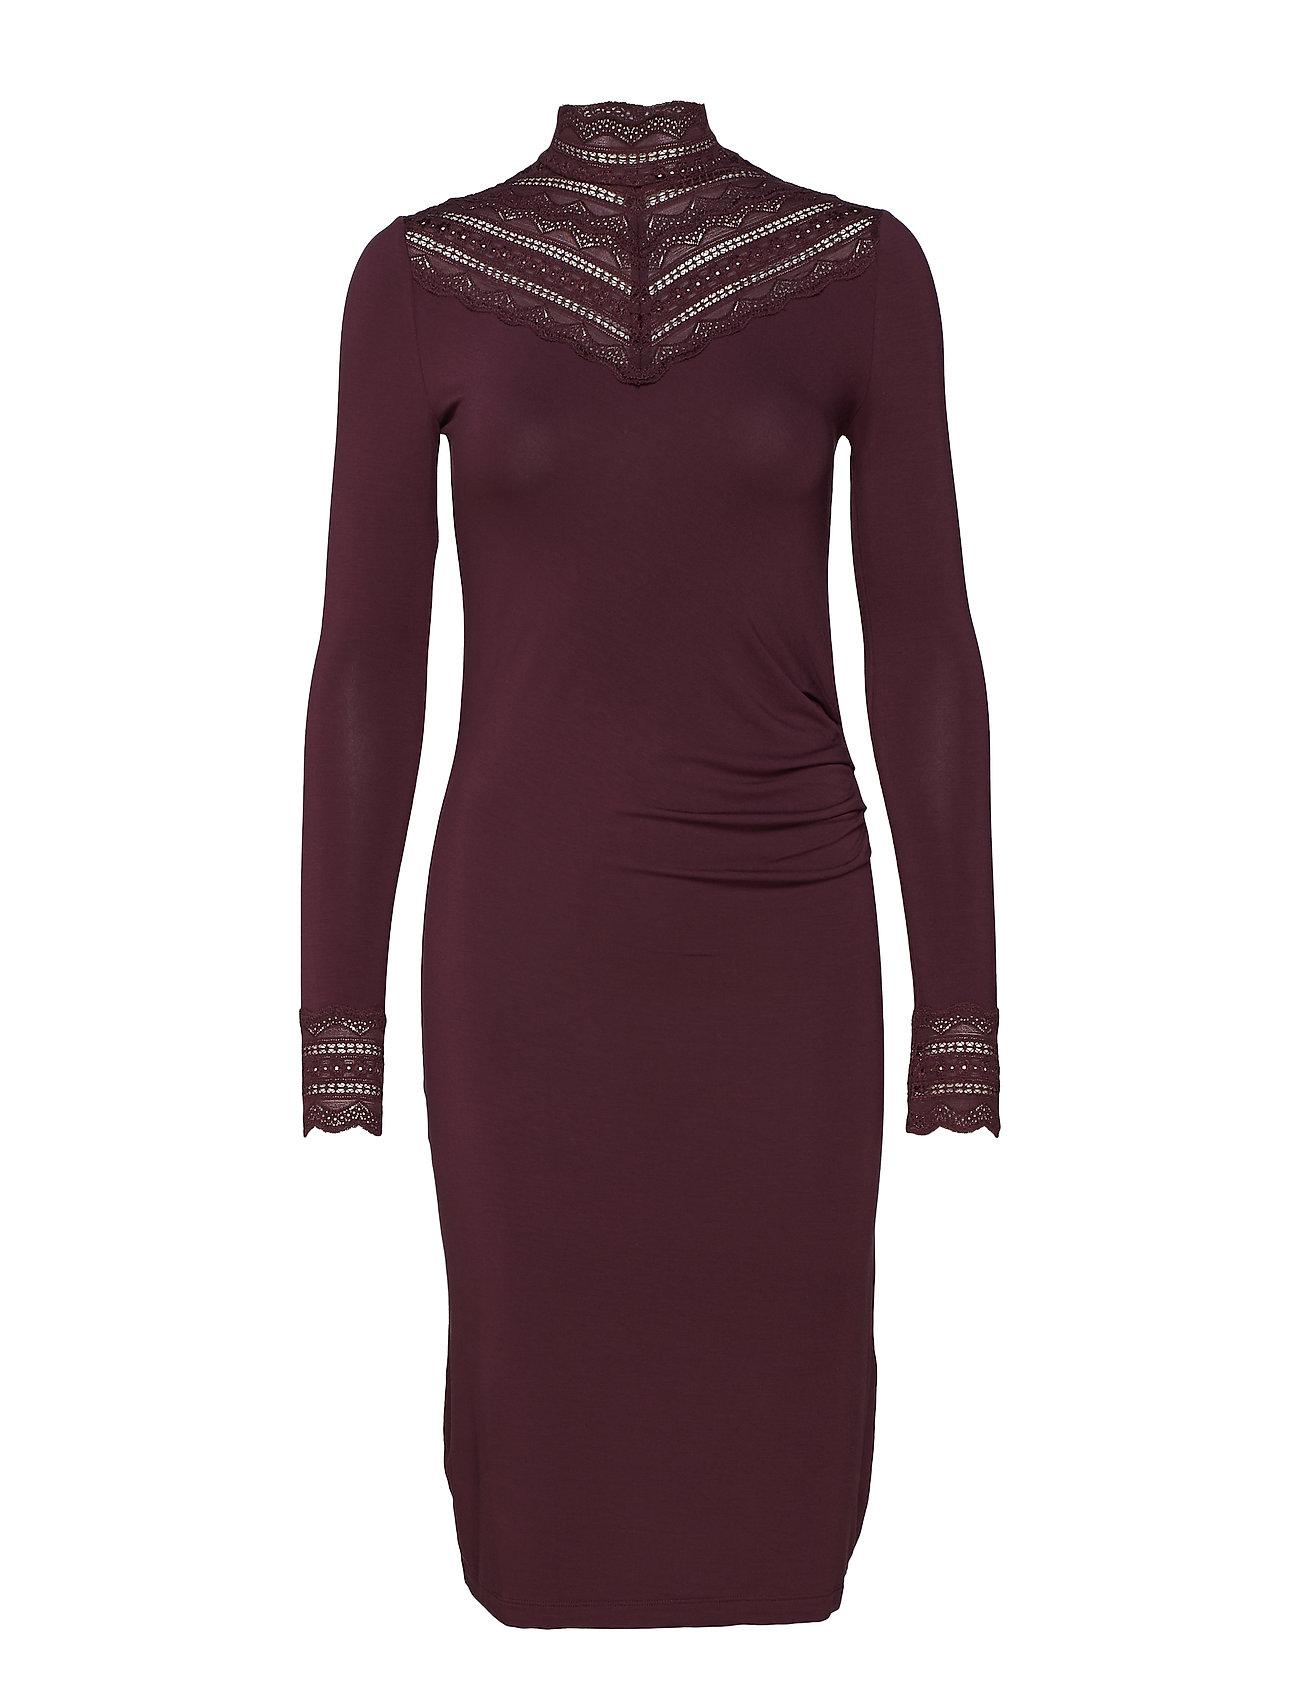 Image of Dress Ls (3075040889)